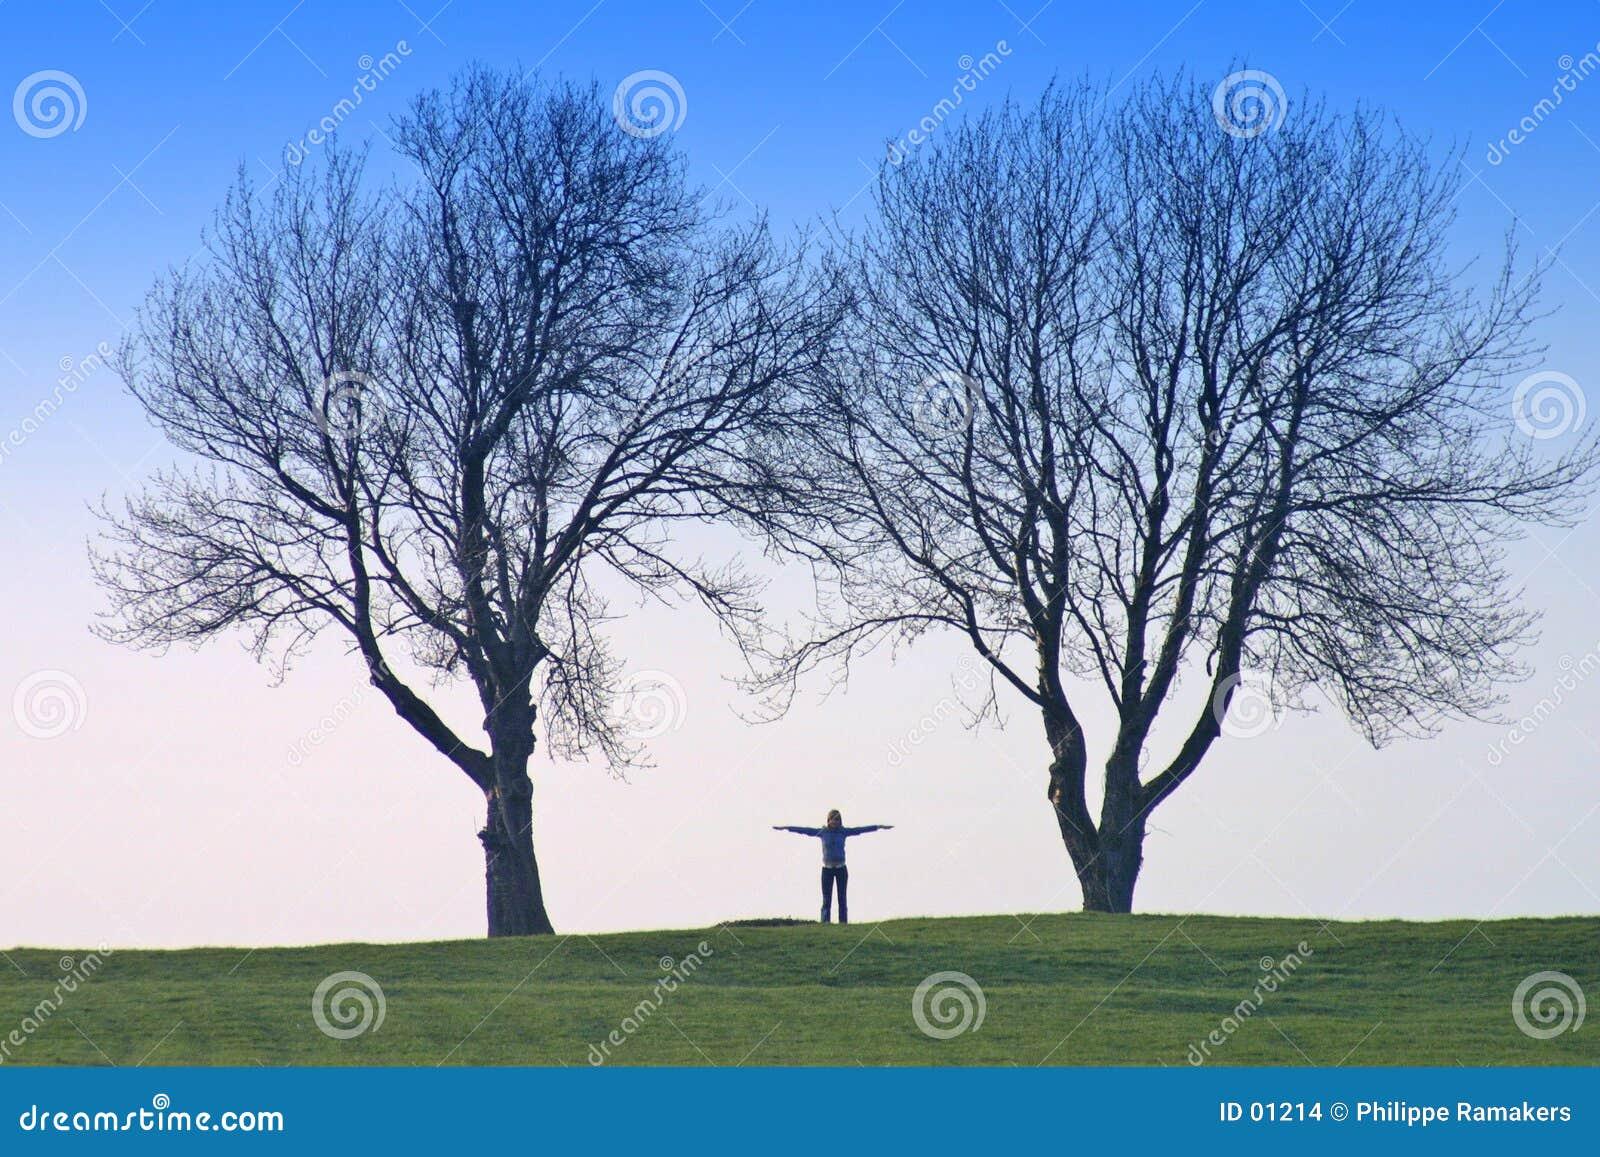 Forme humaine et arbres